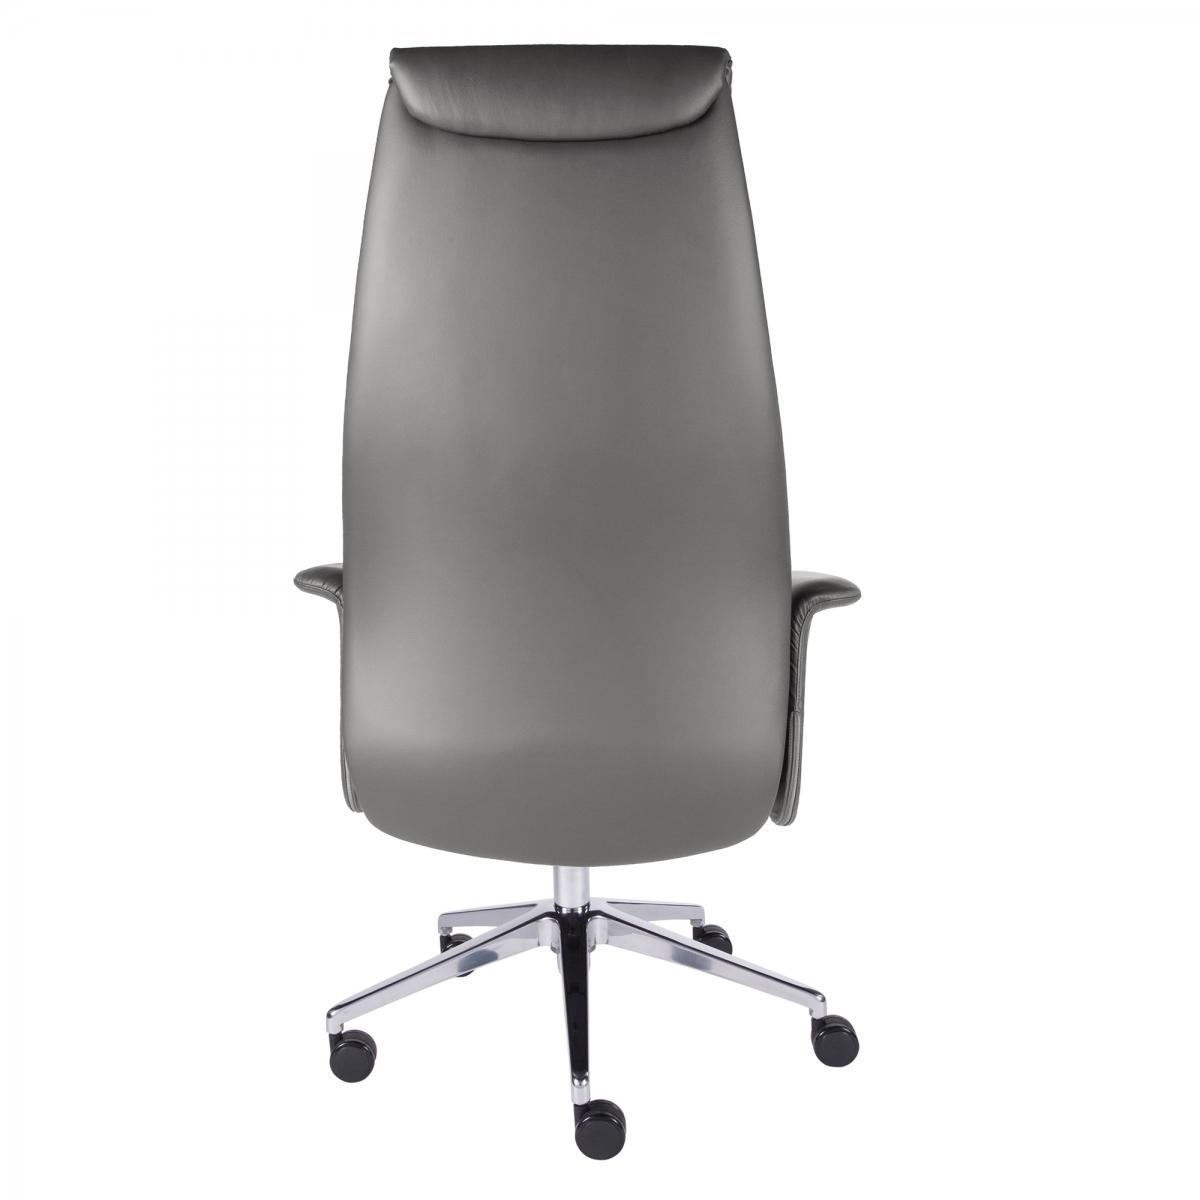 Ilario High-Back Executive Chair Charcoal